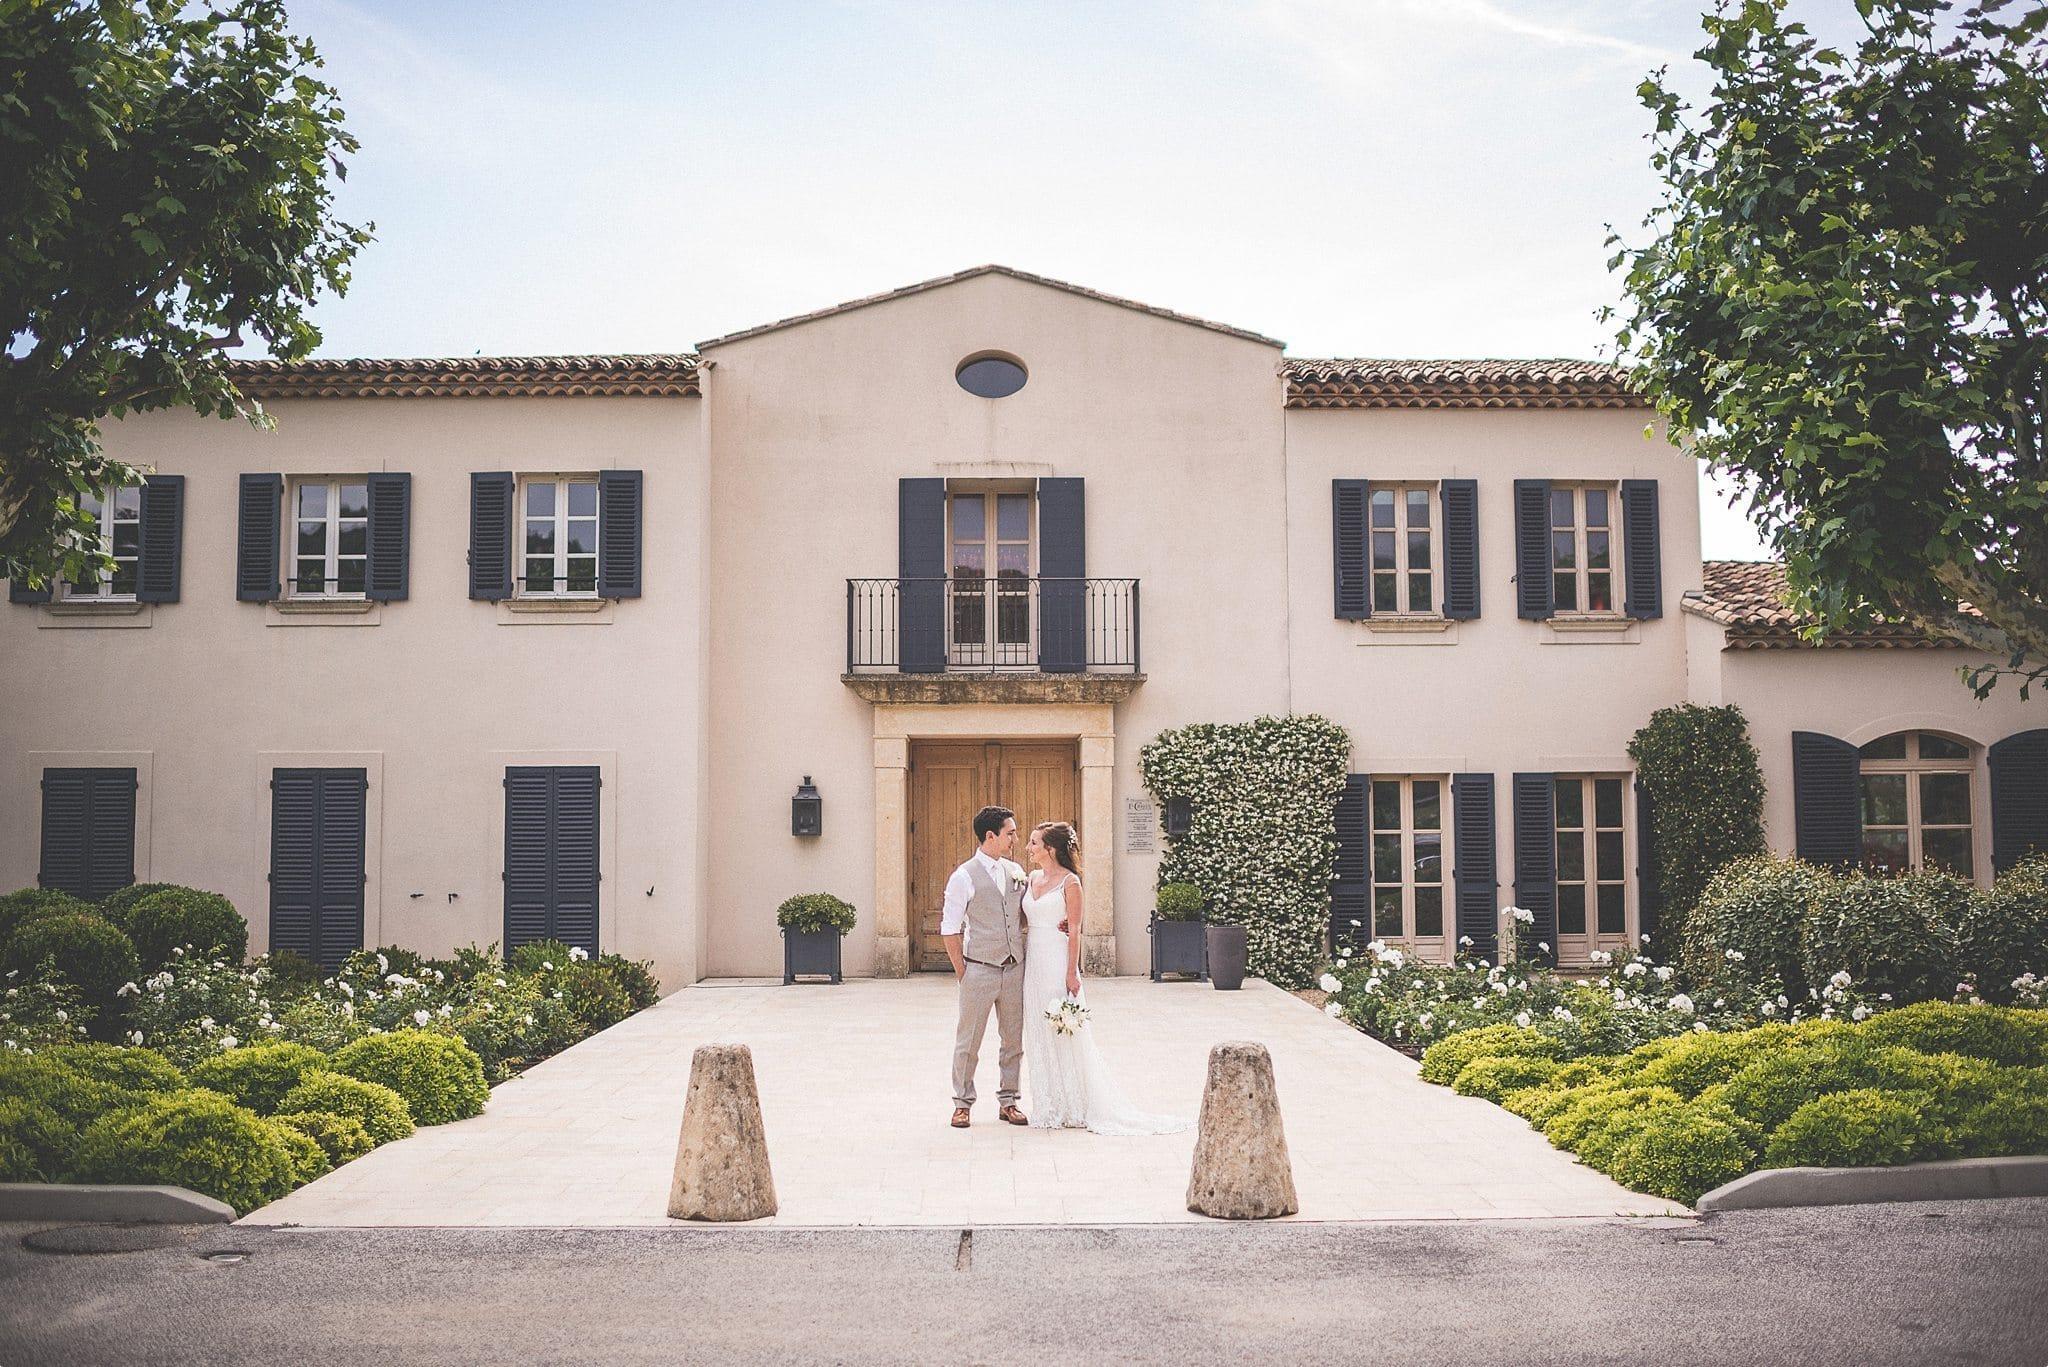 Domaine de la Croix Hotel L'Orangerie South of France vineyard and beach Wedding - Maria Assia Photography-287